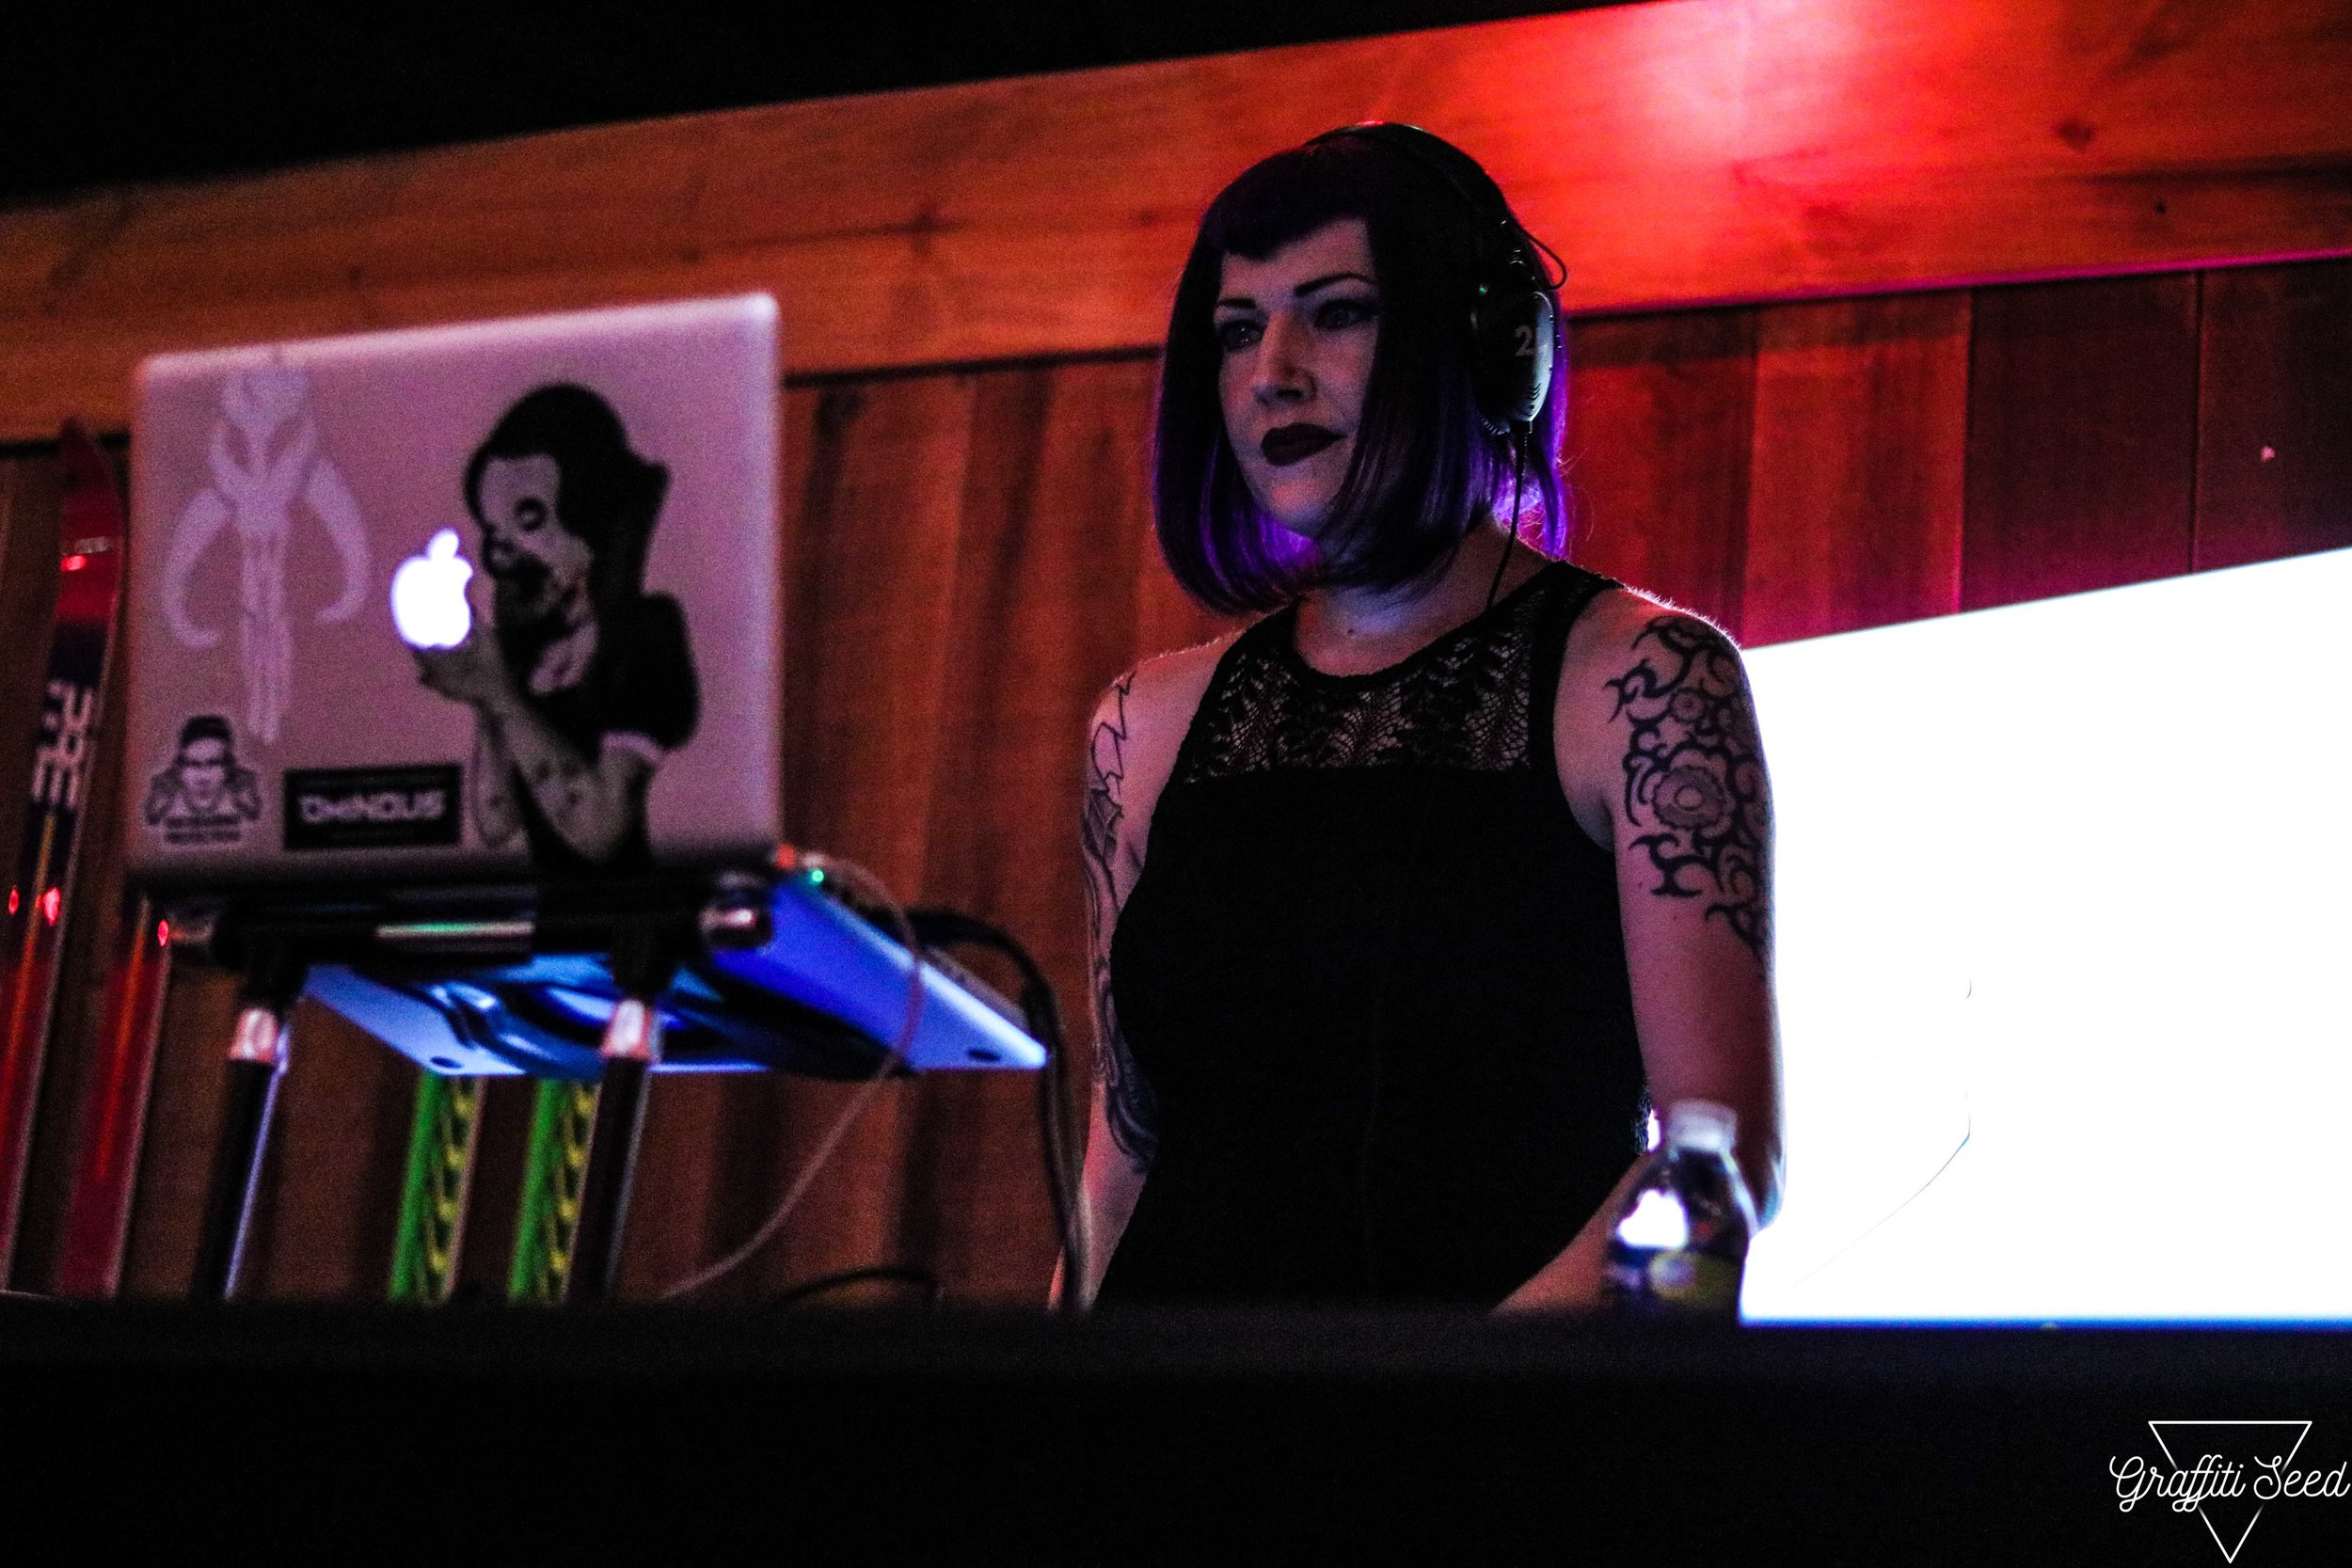 DJ SLAVE1 | Grandoozy 2018 _ www.GraffitiSeed.com 4.jpg